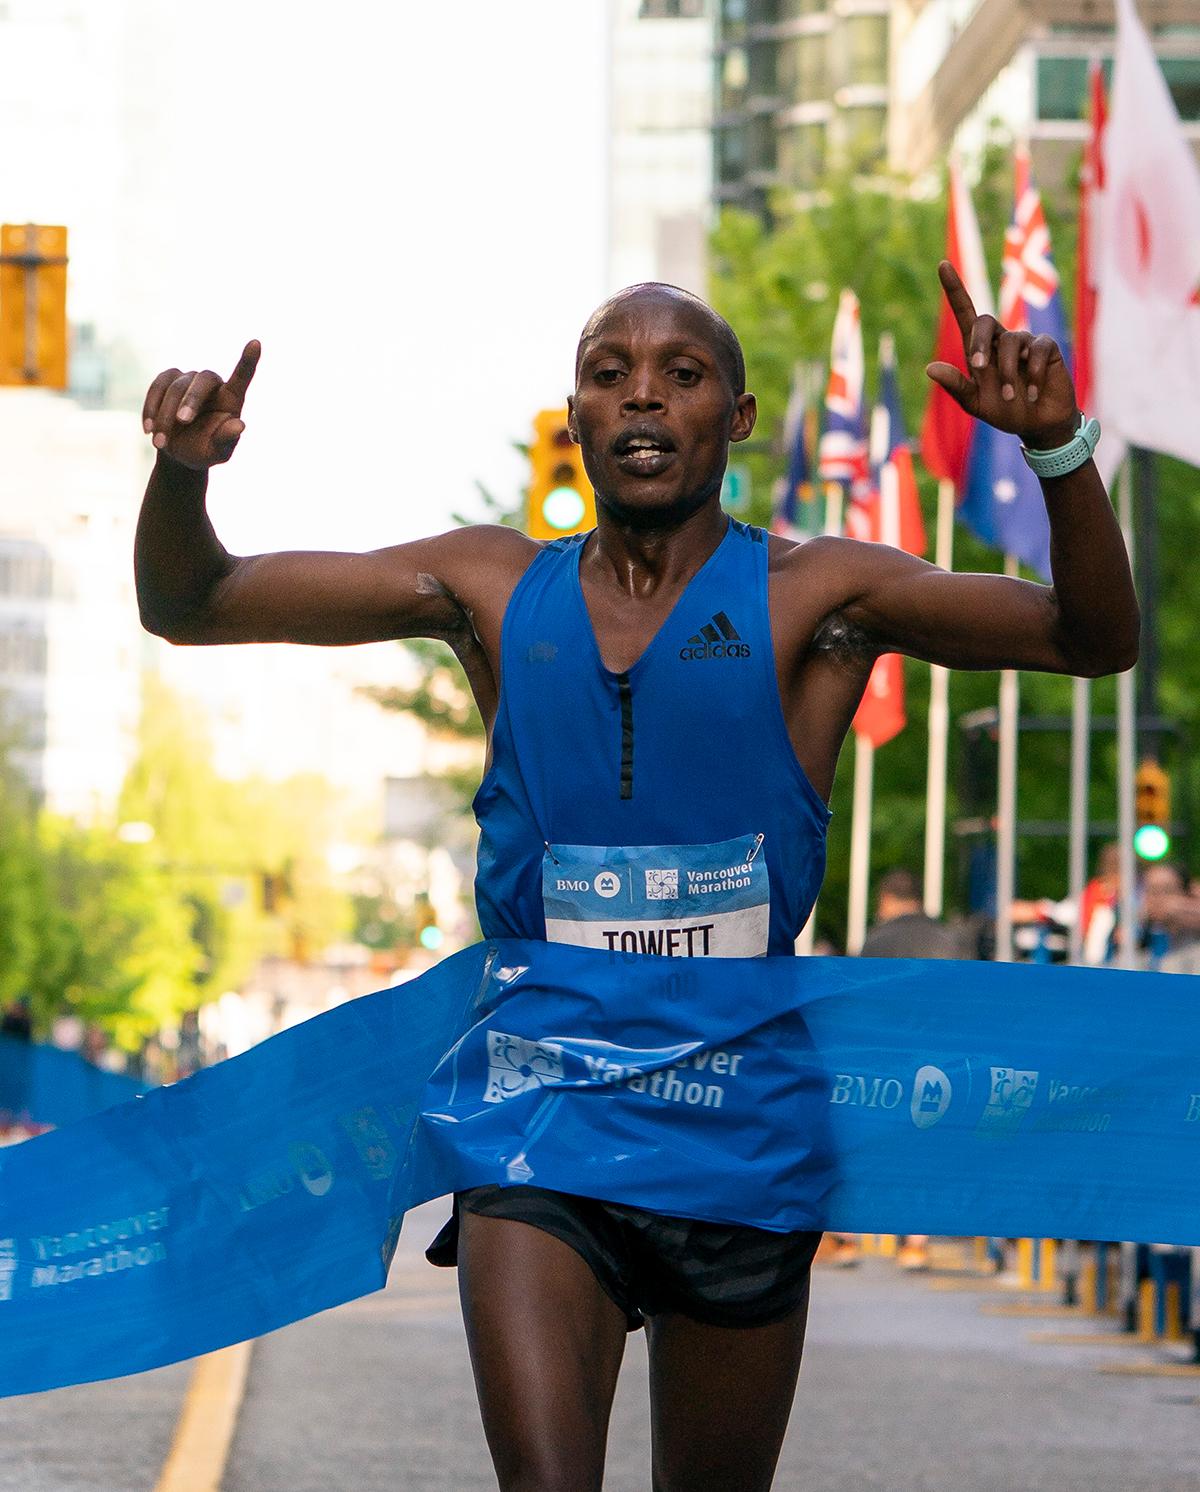 George Towett BMO Vancouver Marathon Elite